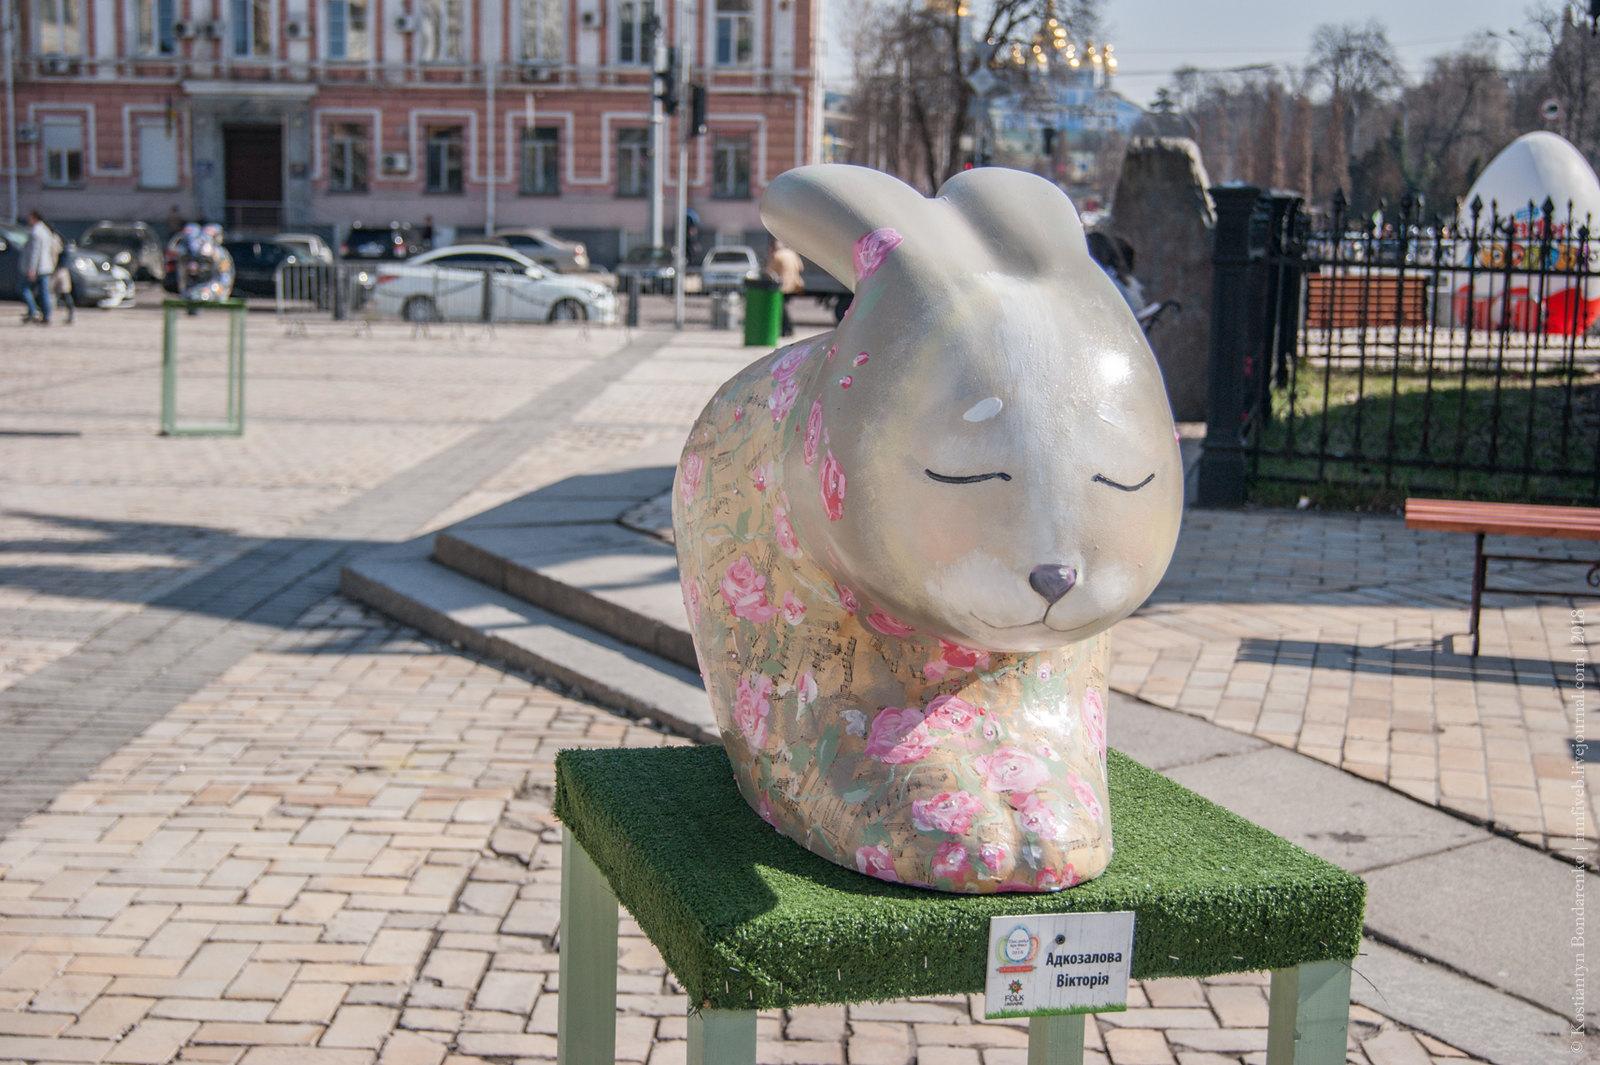 201804010 - Easter-19